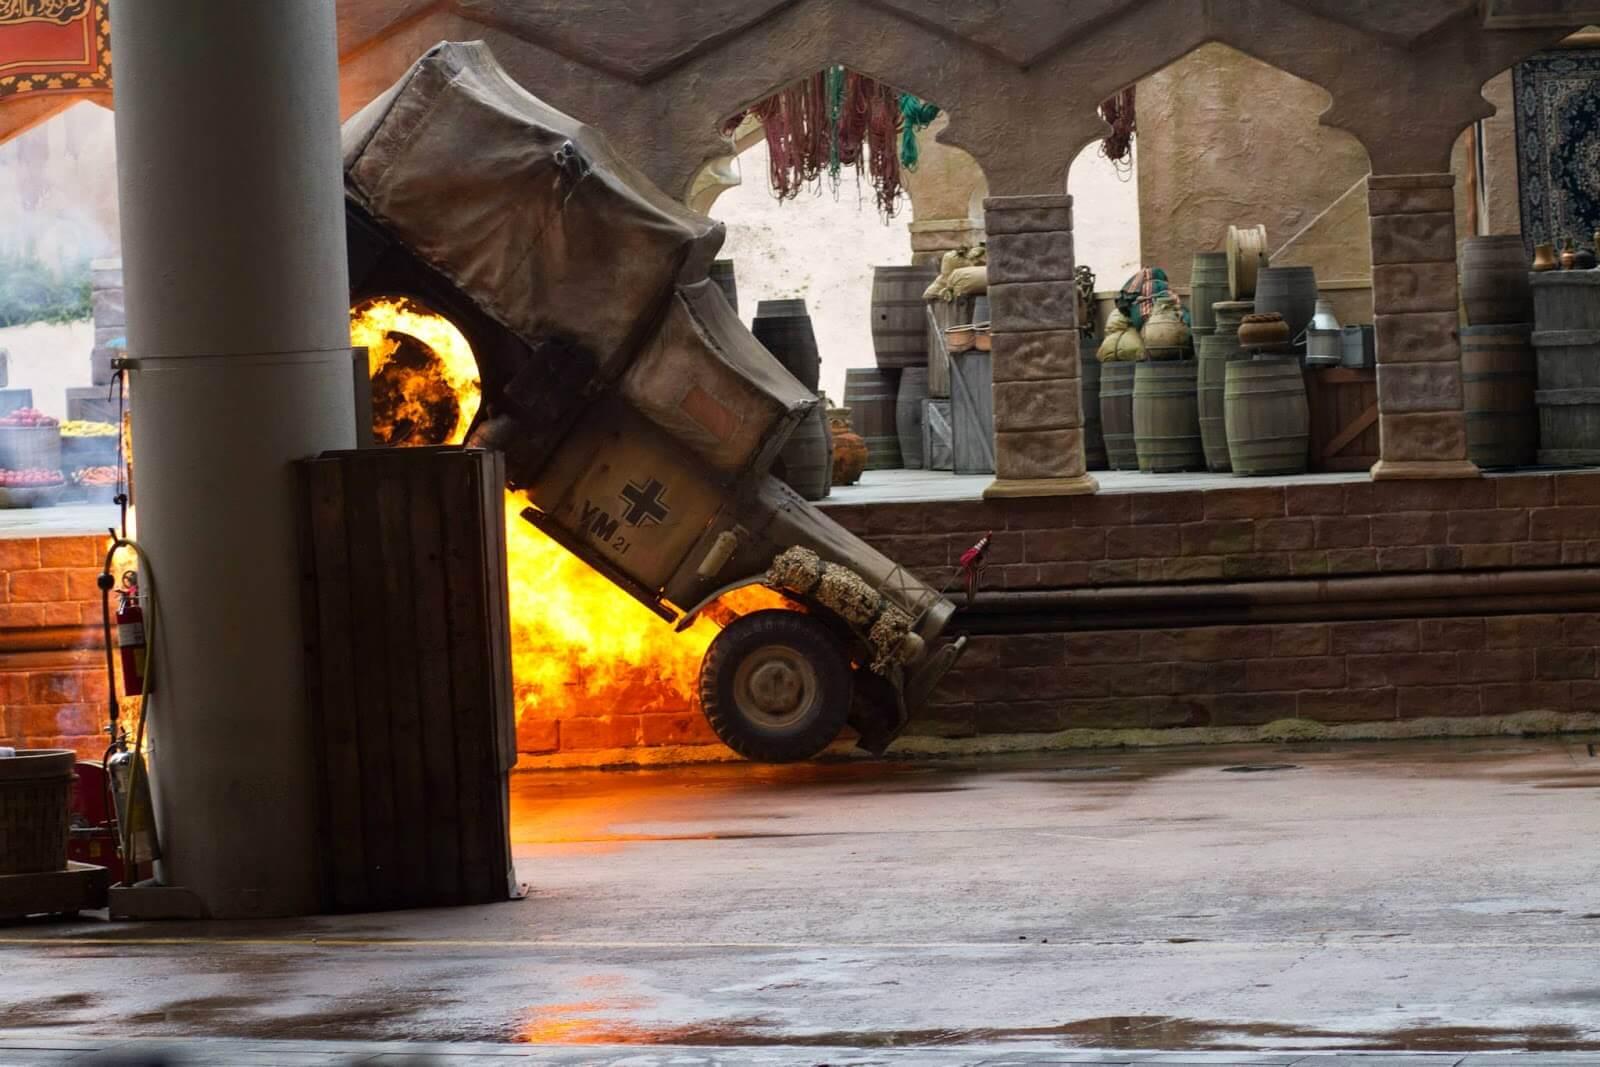 Indiana Jones Stunt Show at Hollywood Studios